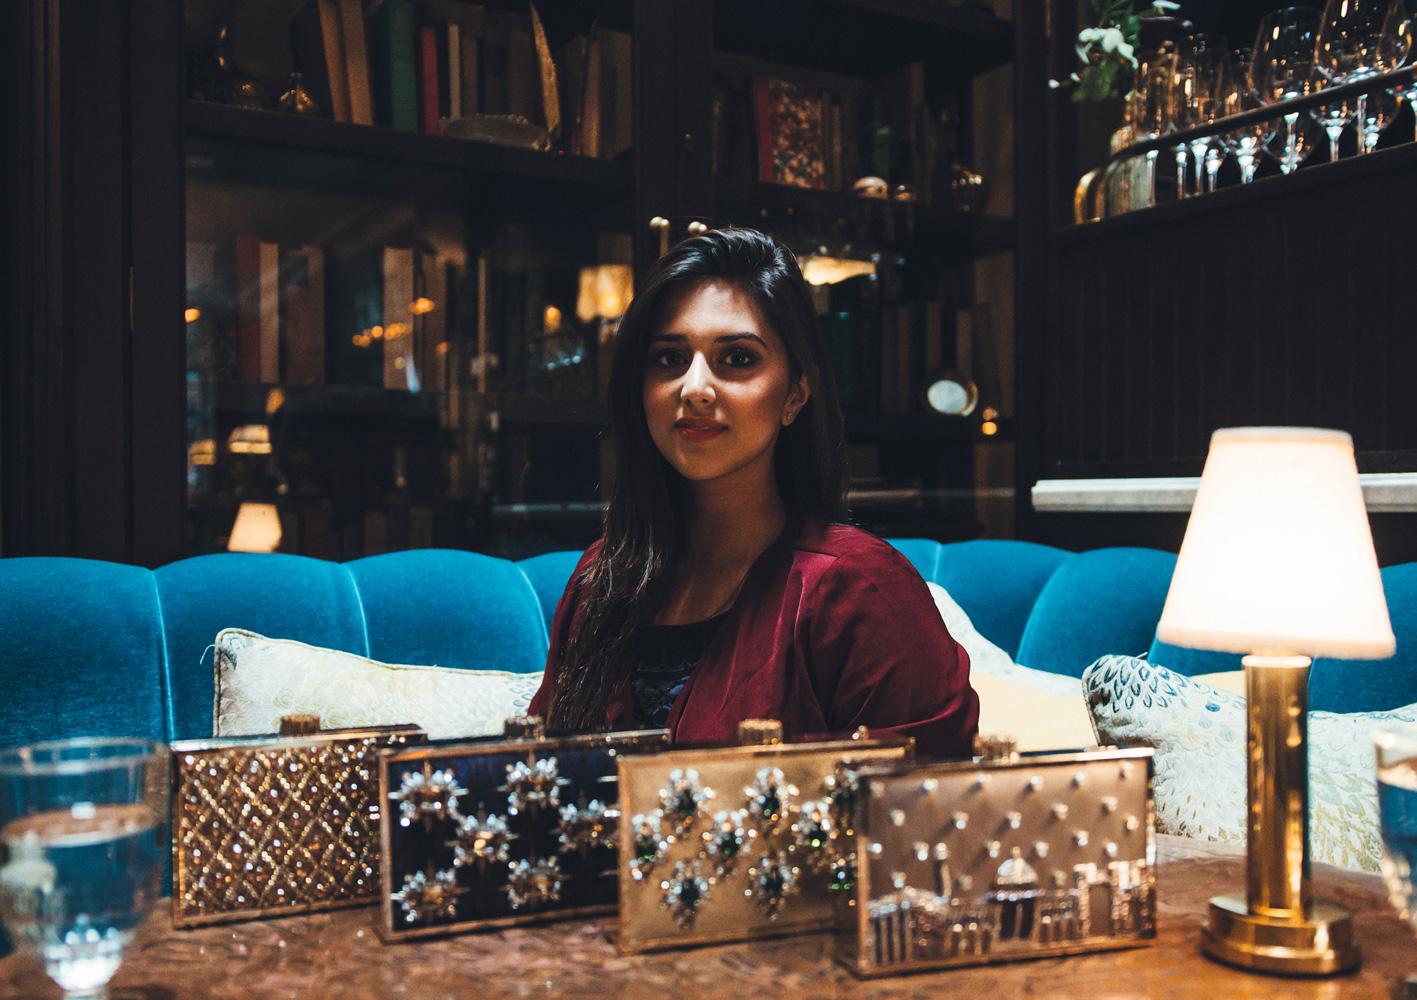 Minza Khan's Clutch Collection